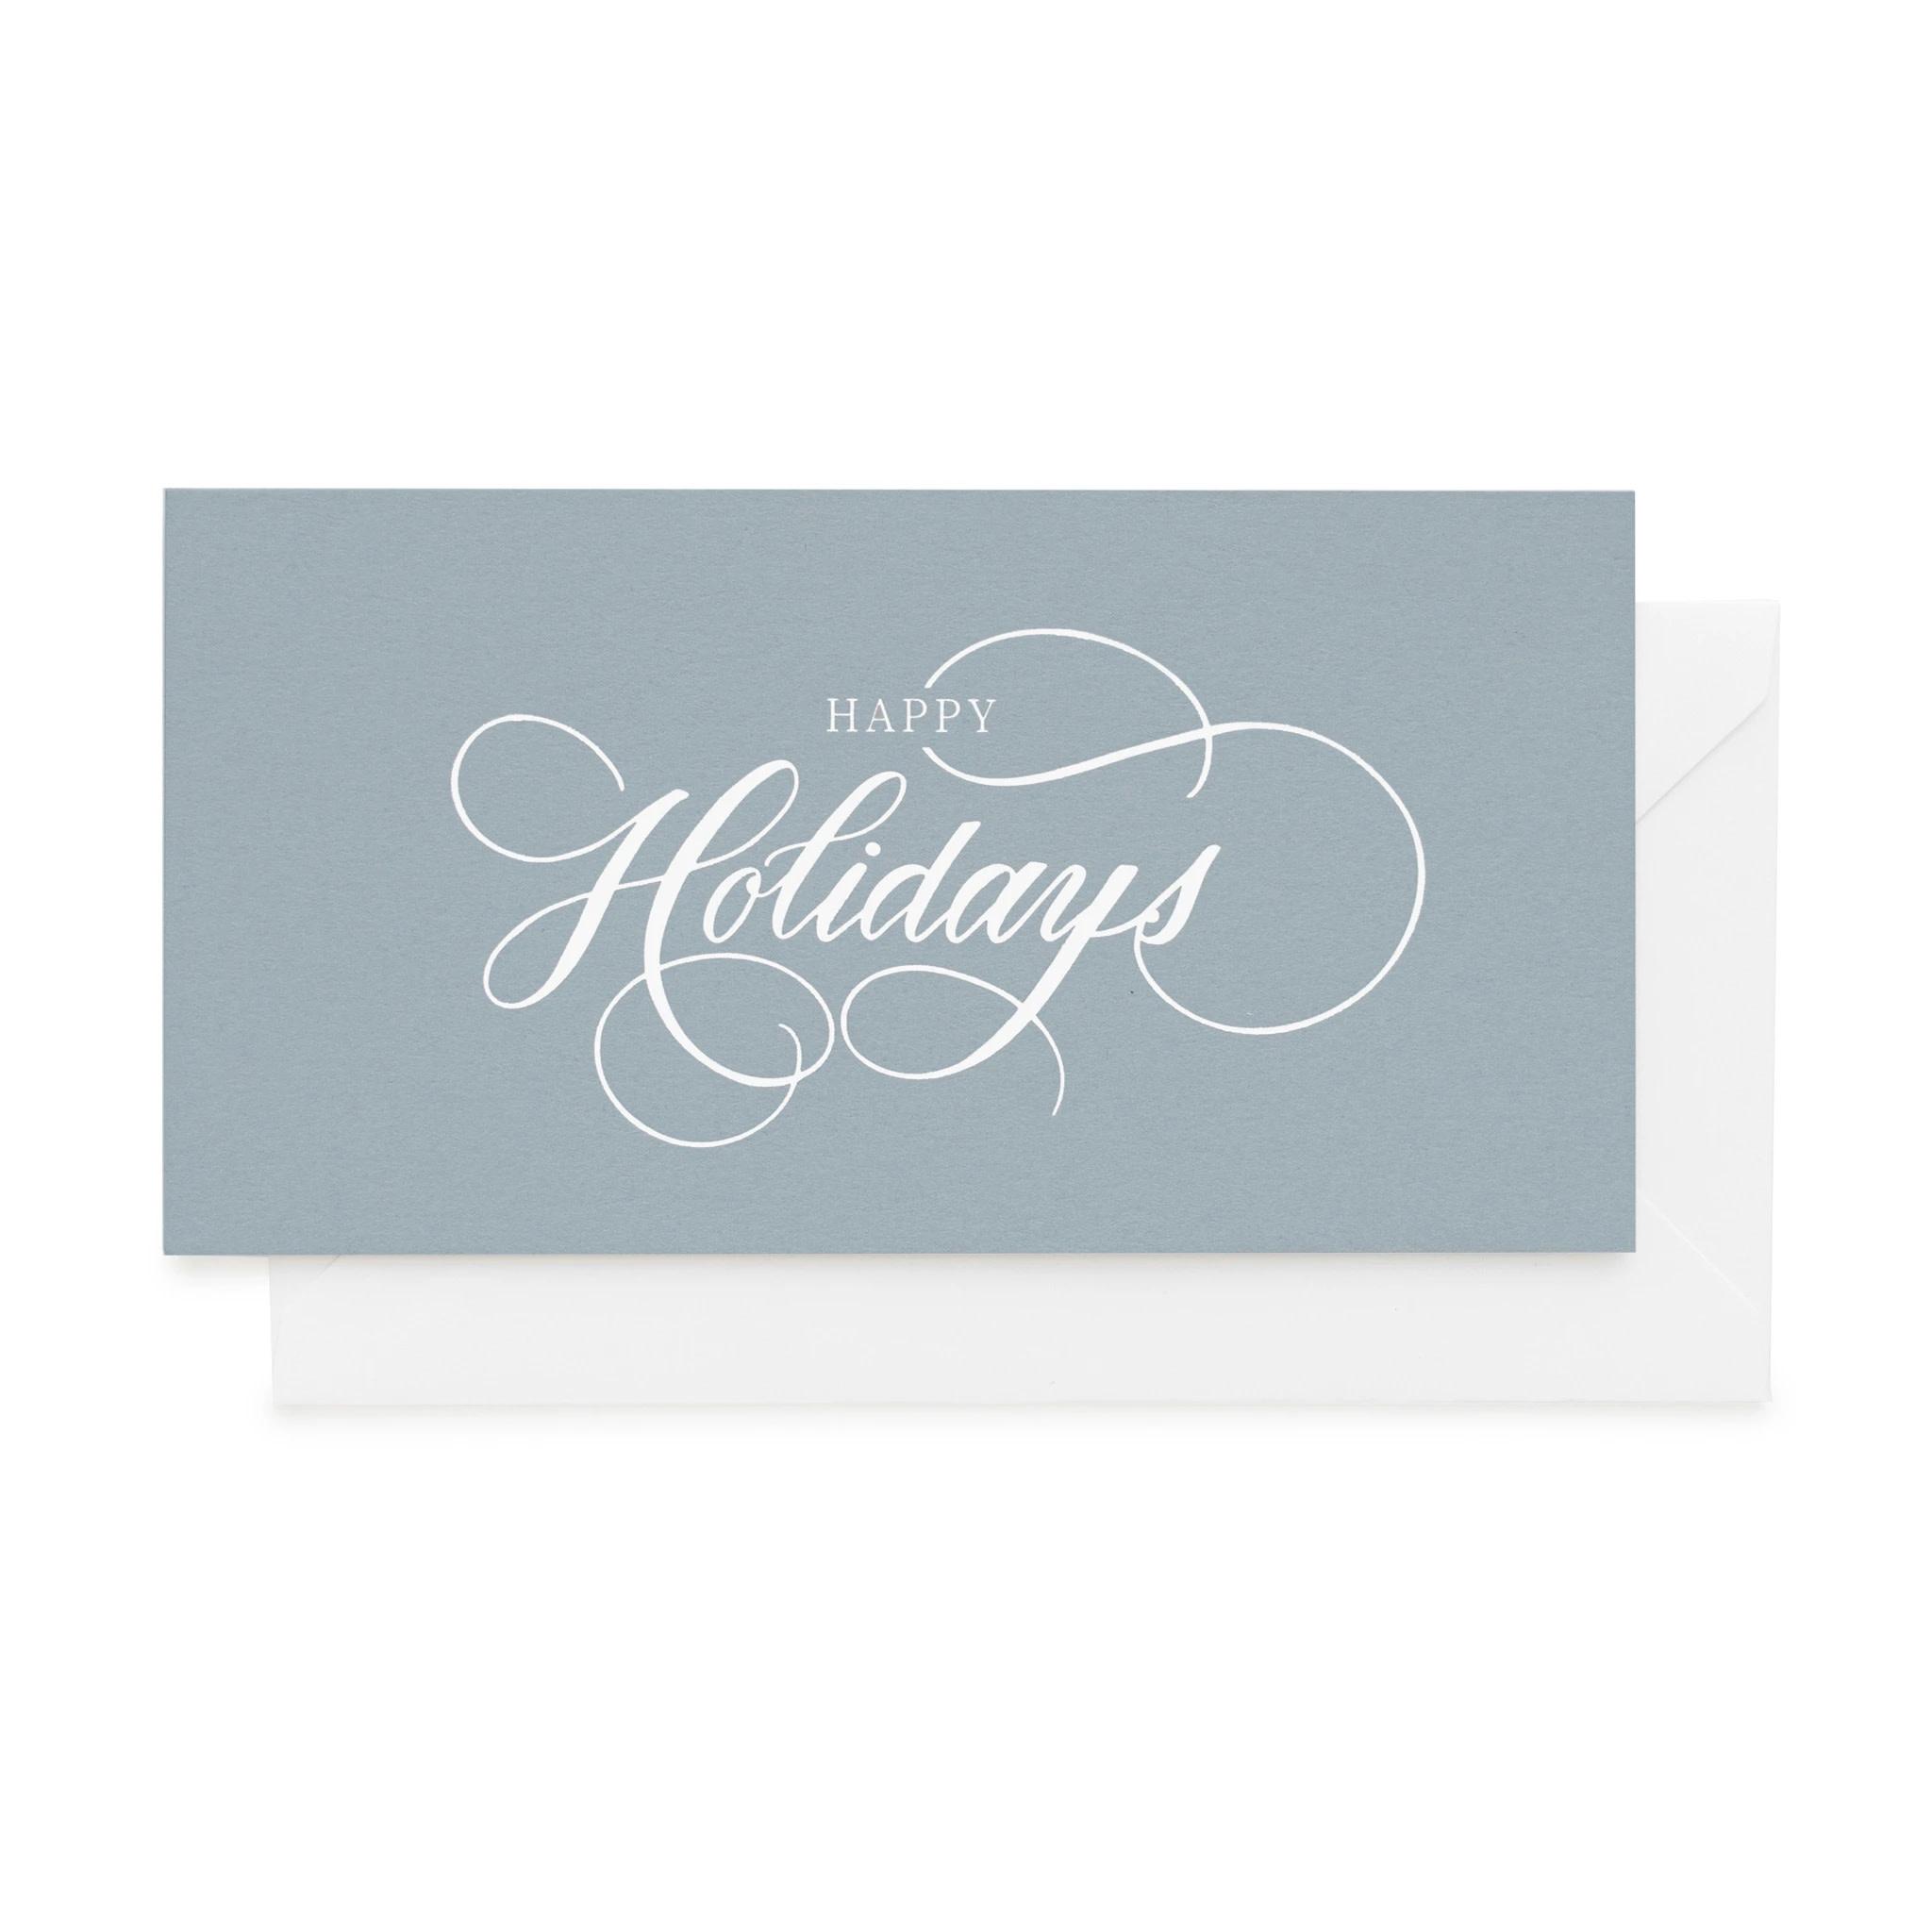 Sugar Paper - SUG Sugar Paper Happy Holidays Blue Boxed Set